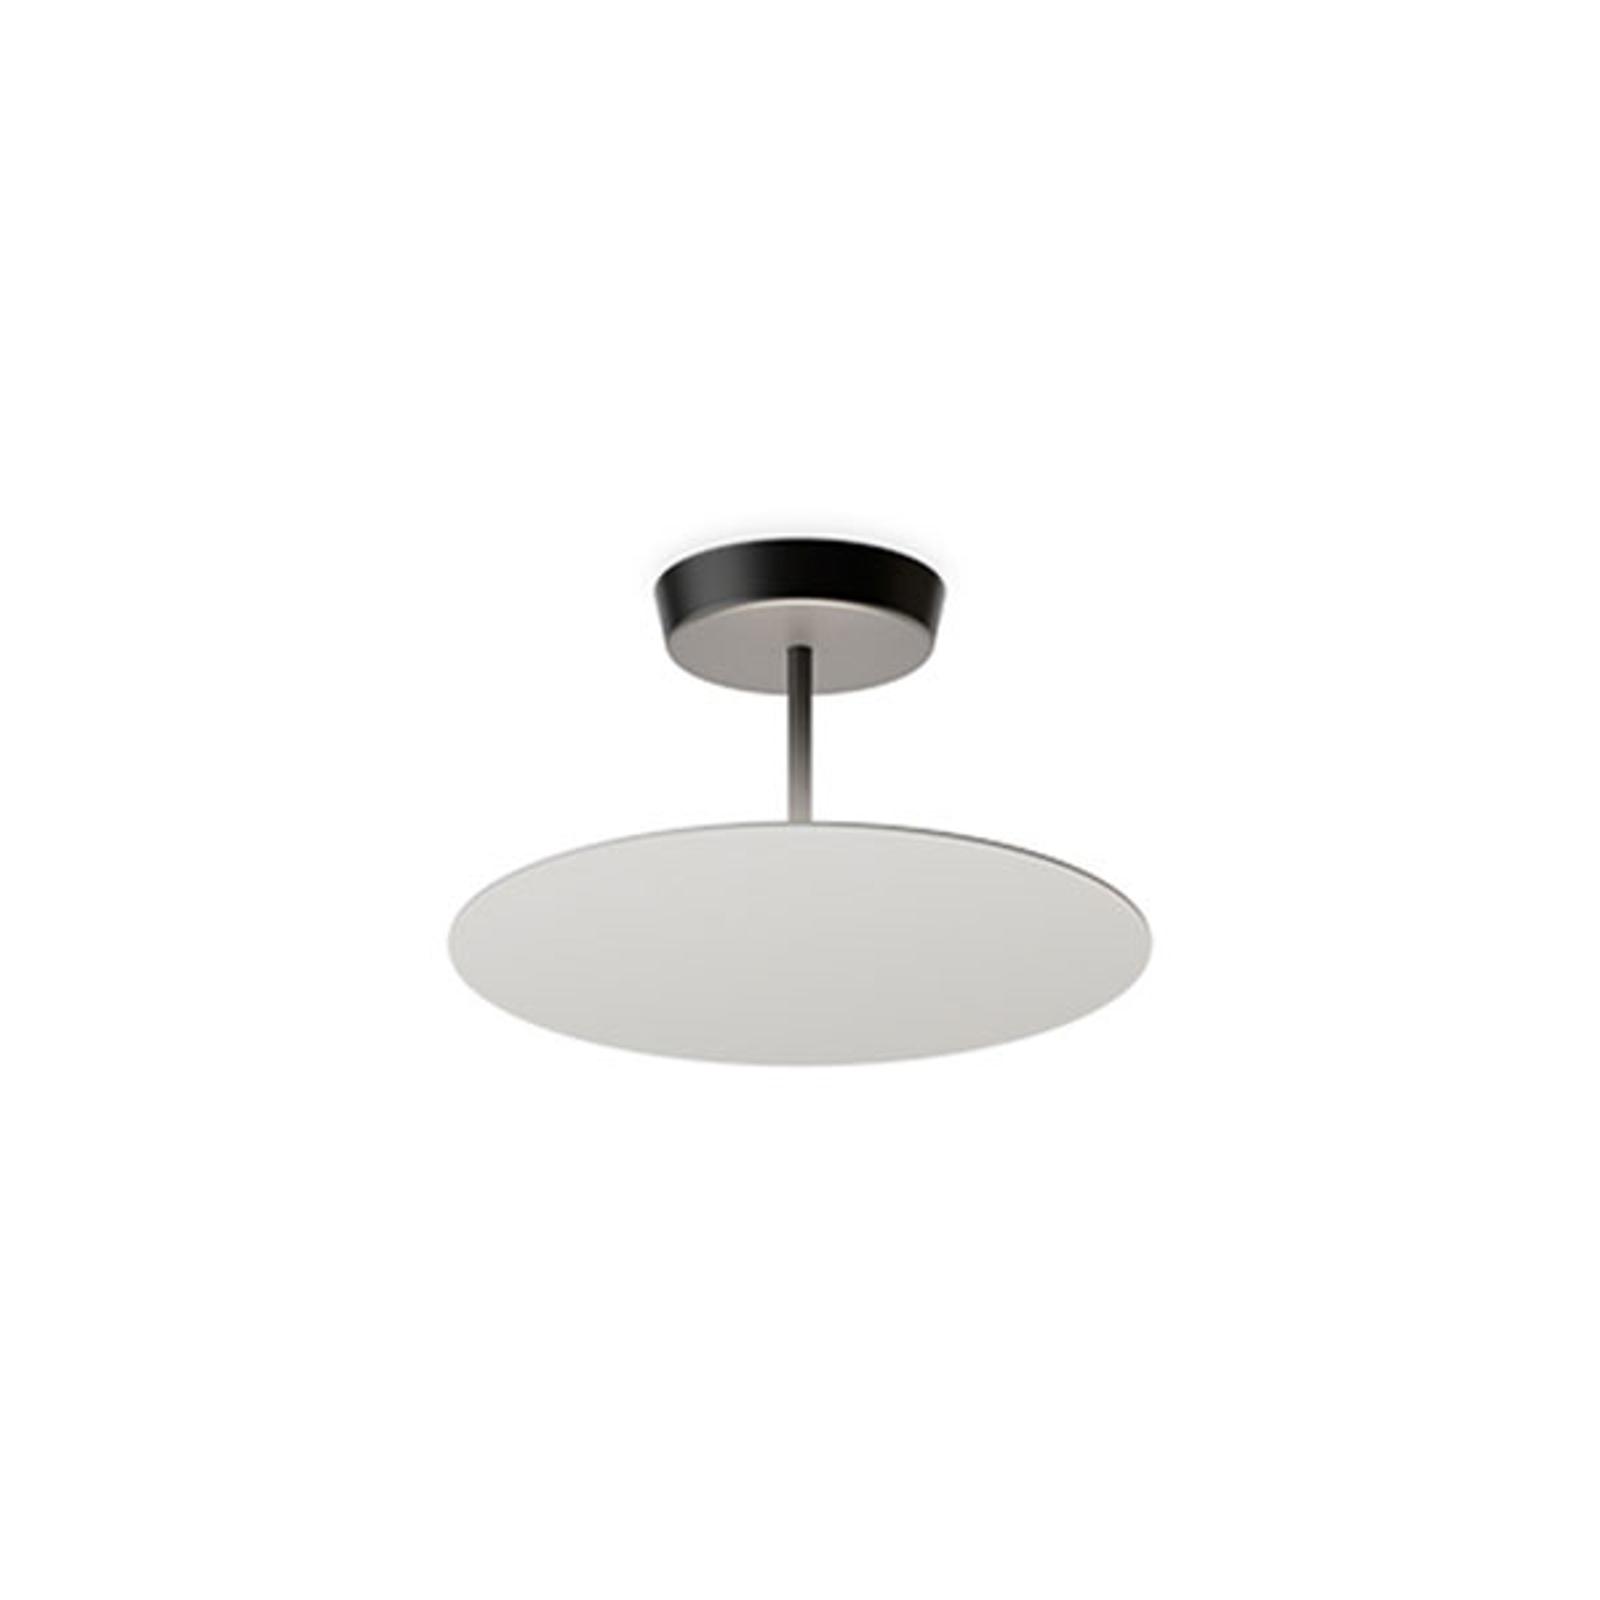 Vibia Flat LED-loftlampe 1 lyskilde Ø 40 cm grå L1